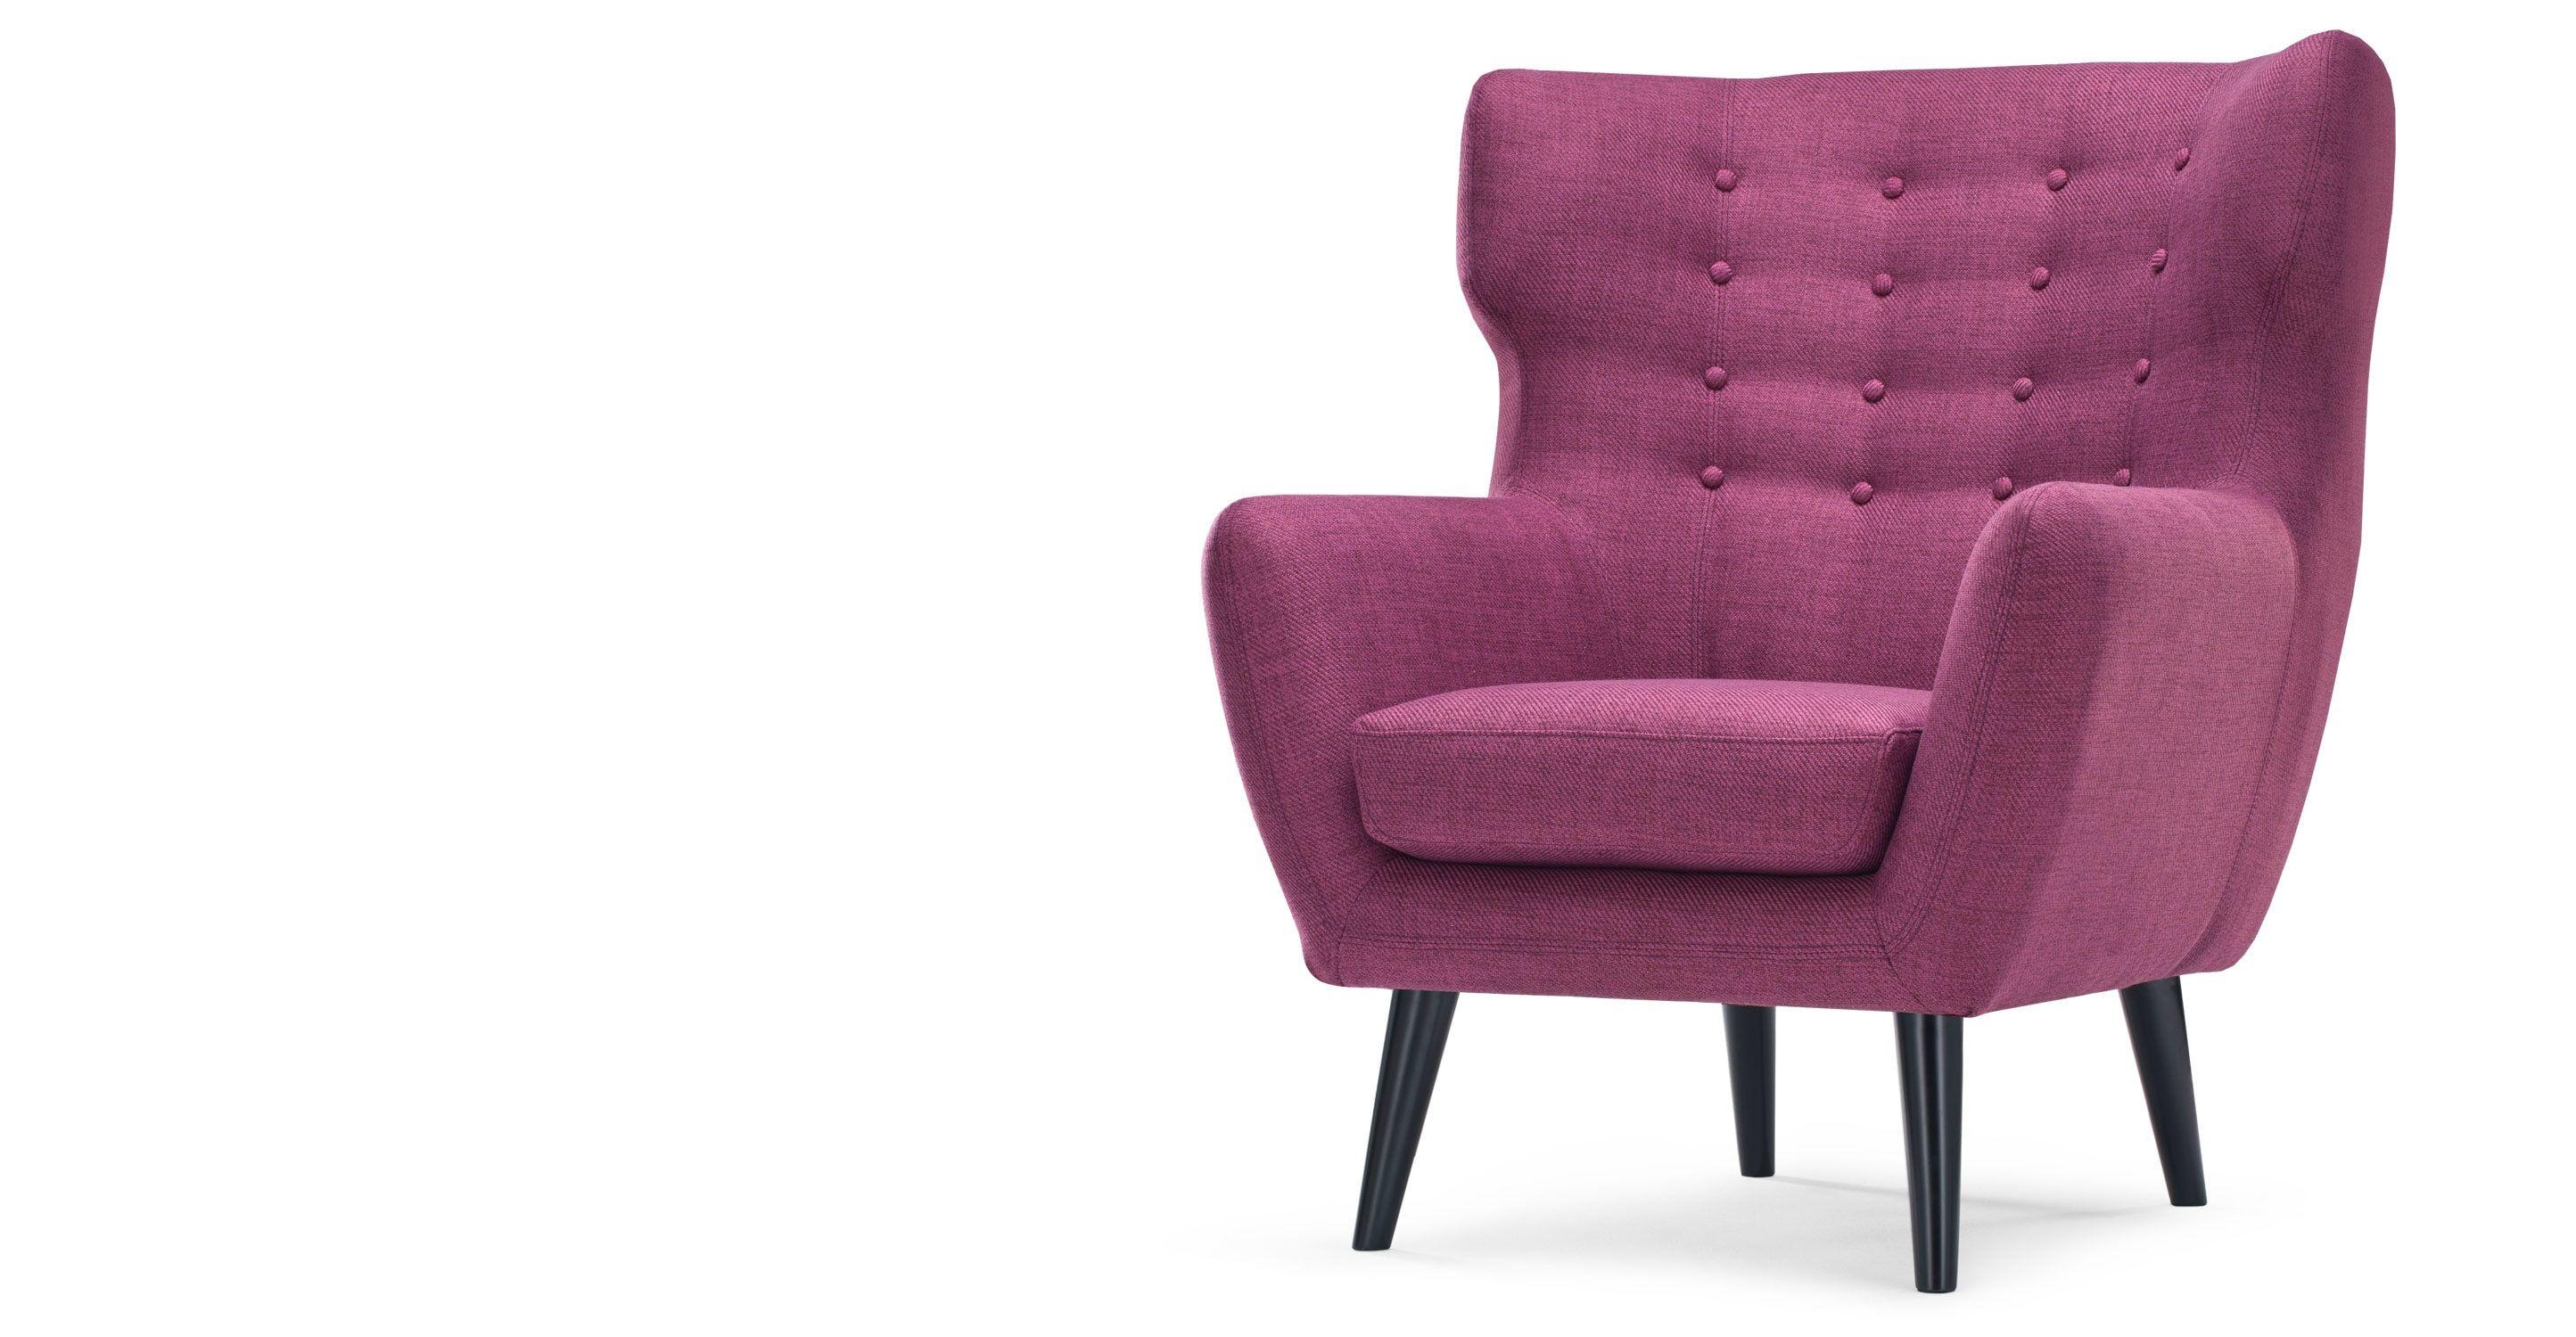 Sedie Marroni ~ Kubrick wing back chair in plum purple anni sedie e ali